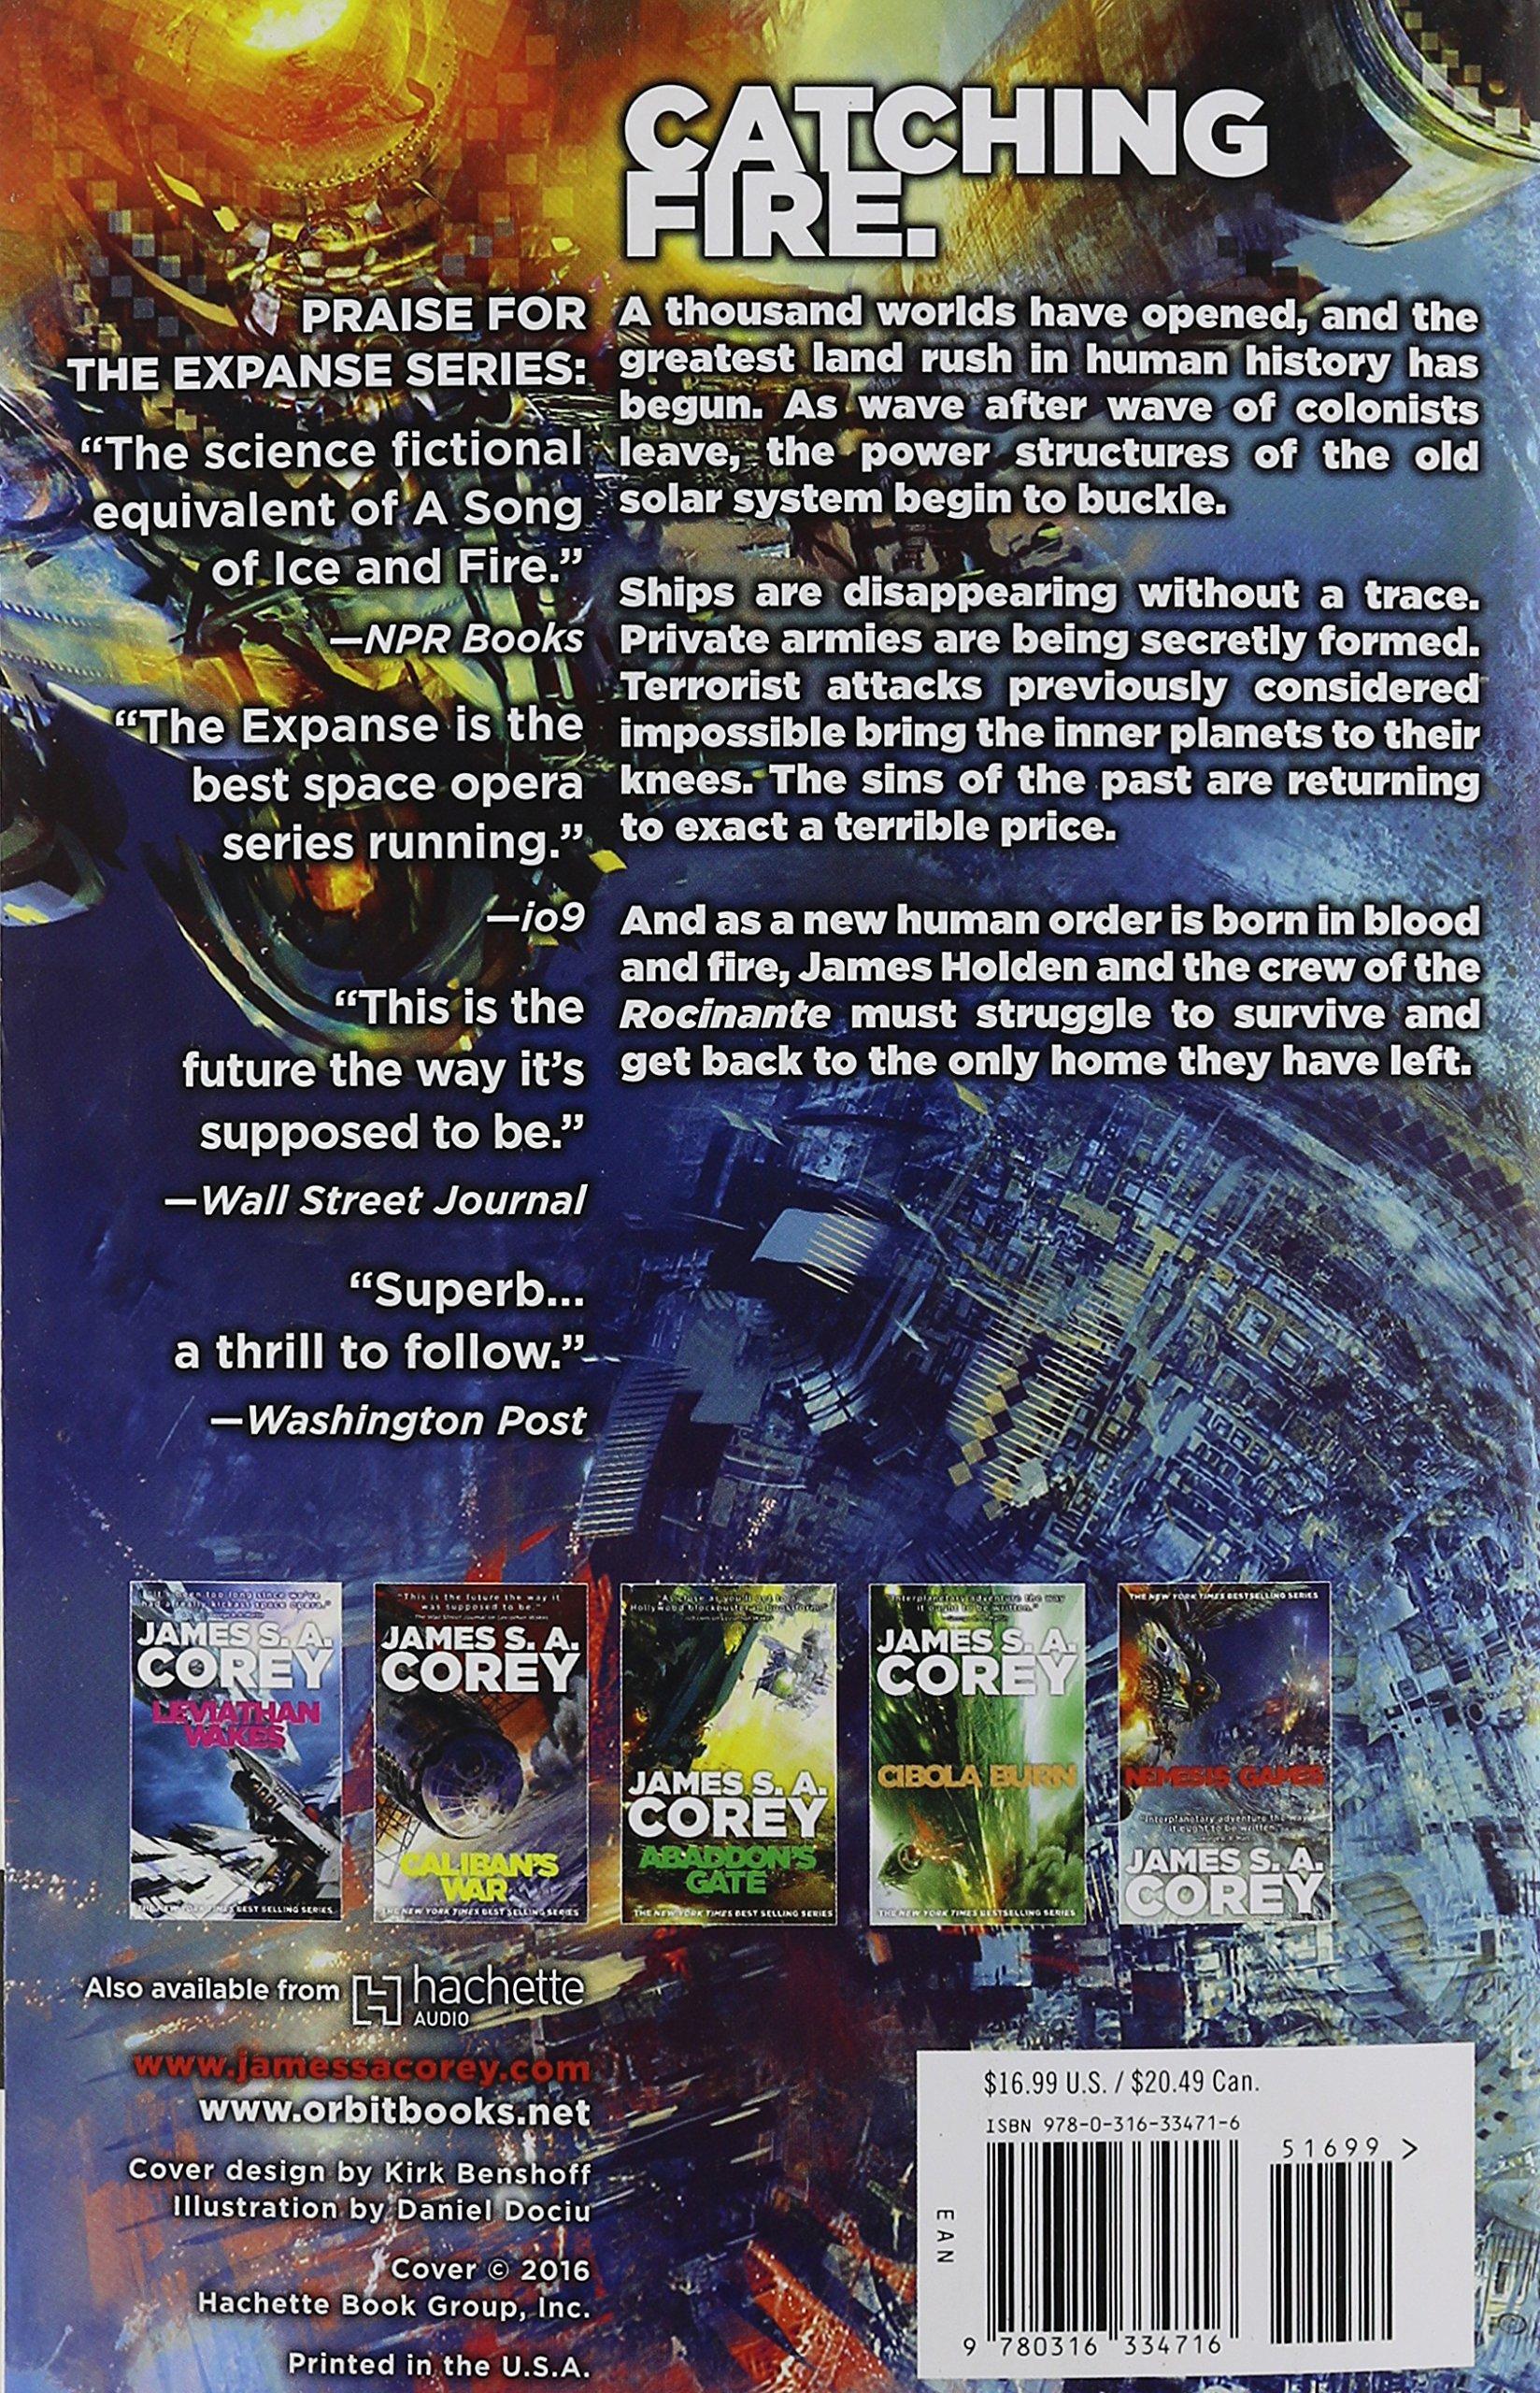 Nemesis Games (the Expanse): James S A Corey: 9780316334716: Amazon:  Books